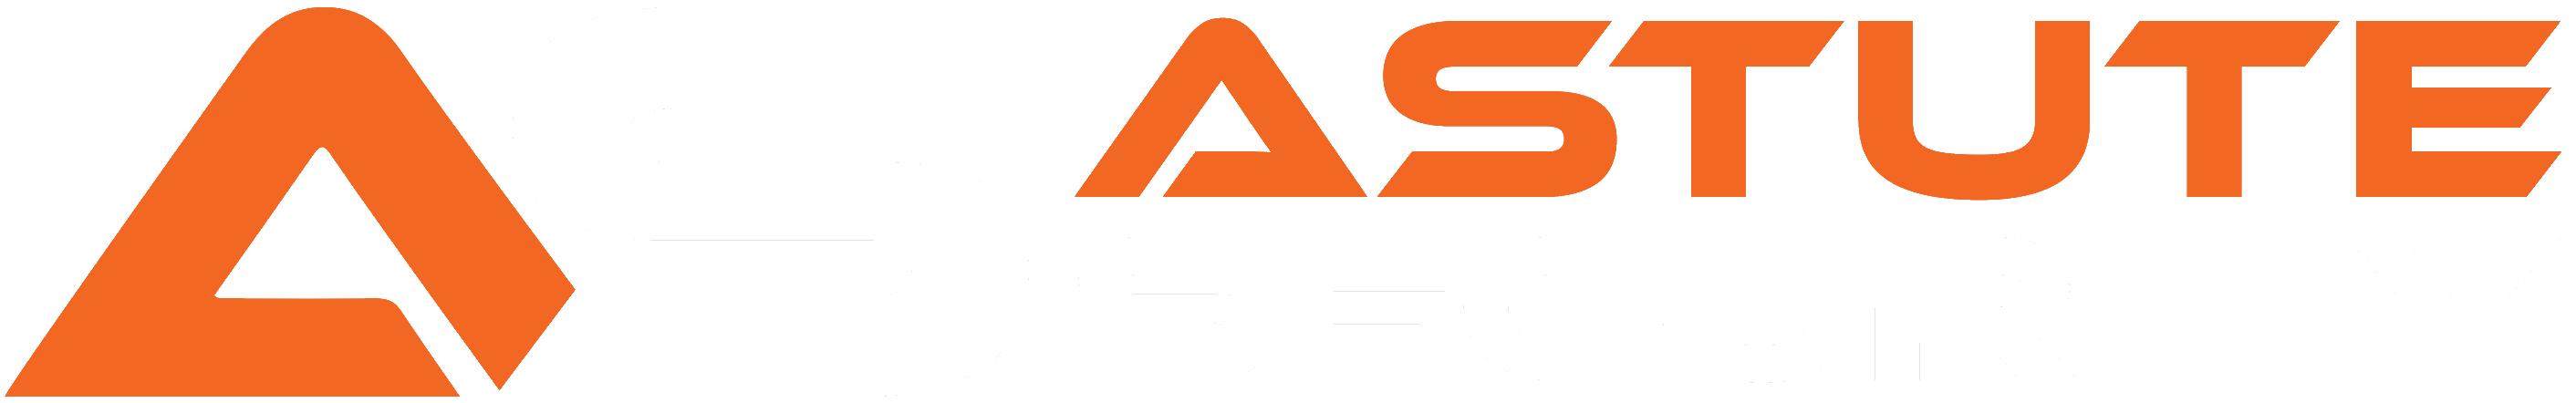 ASTUTE Security